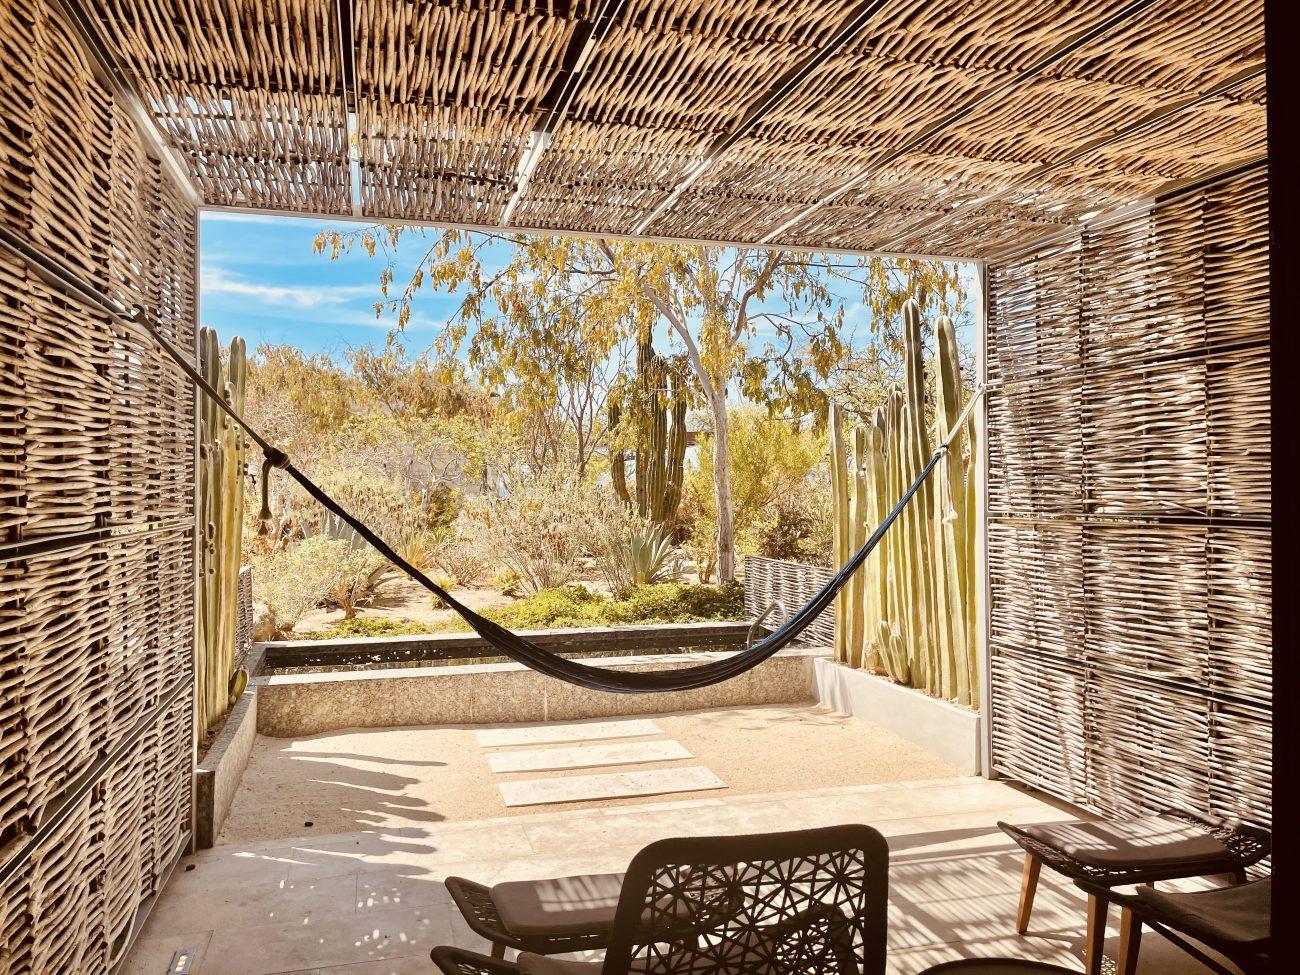 Los Cabos Travel & Lifestyle